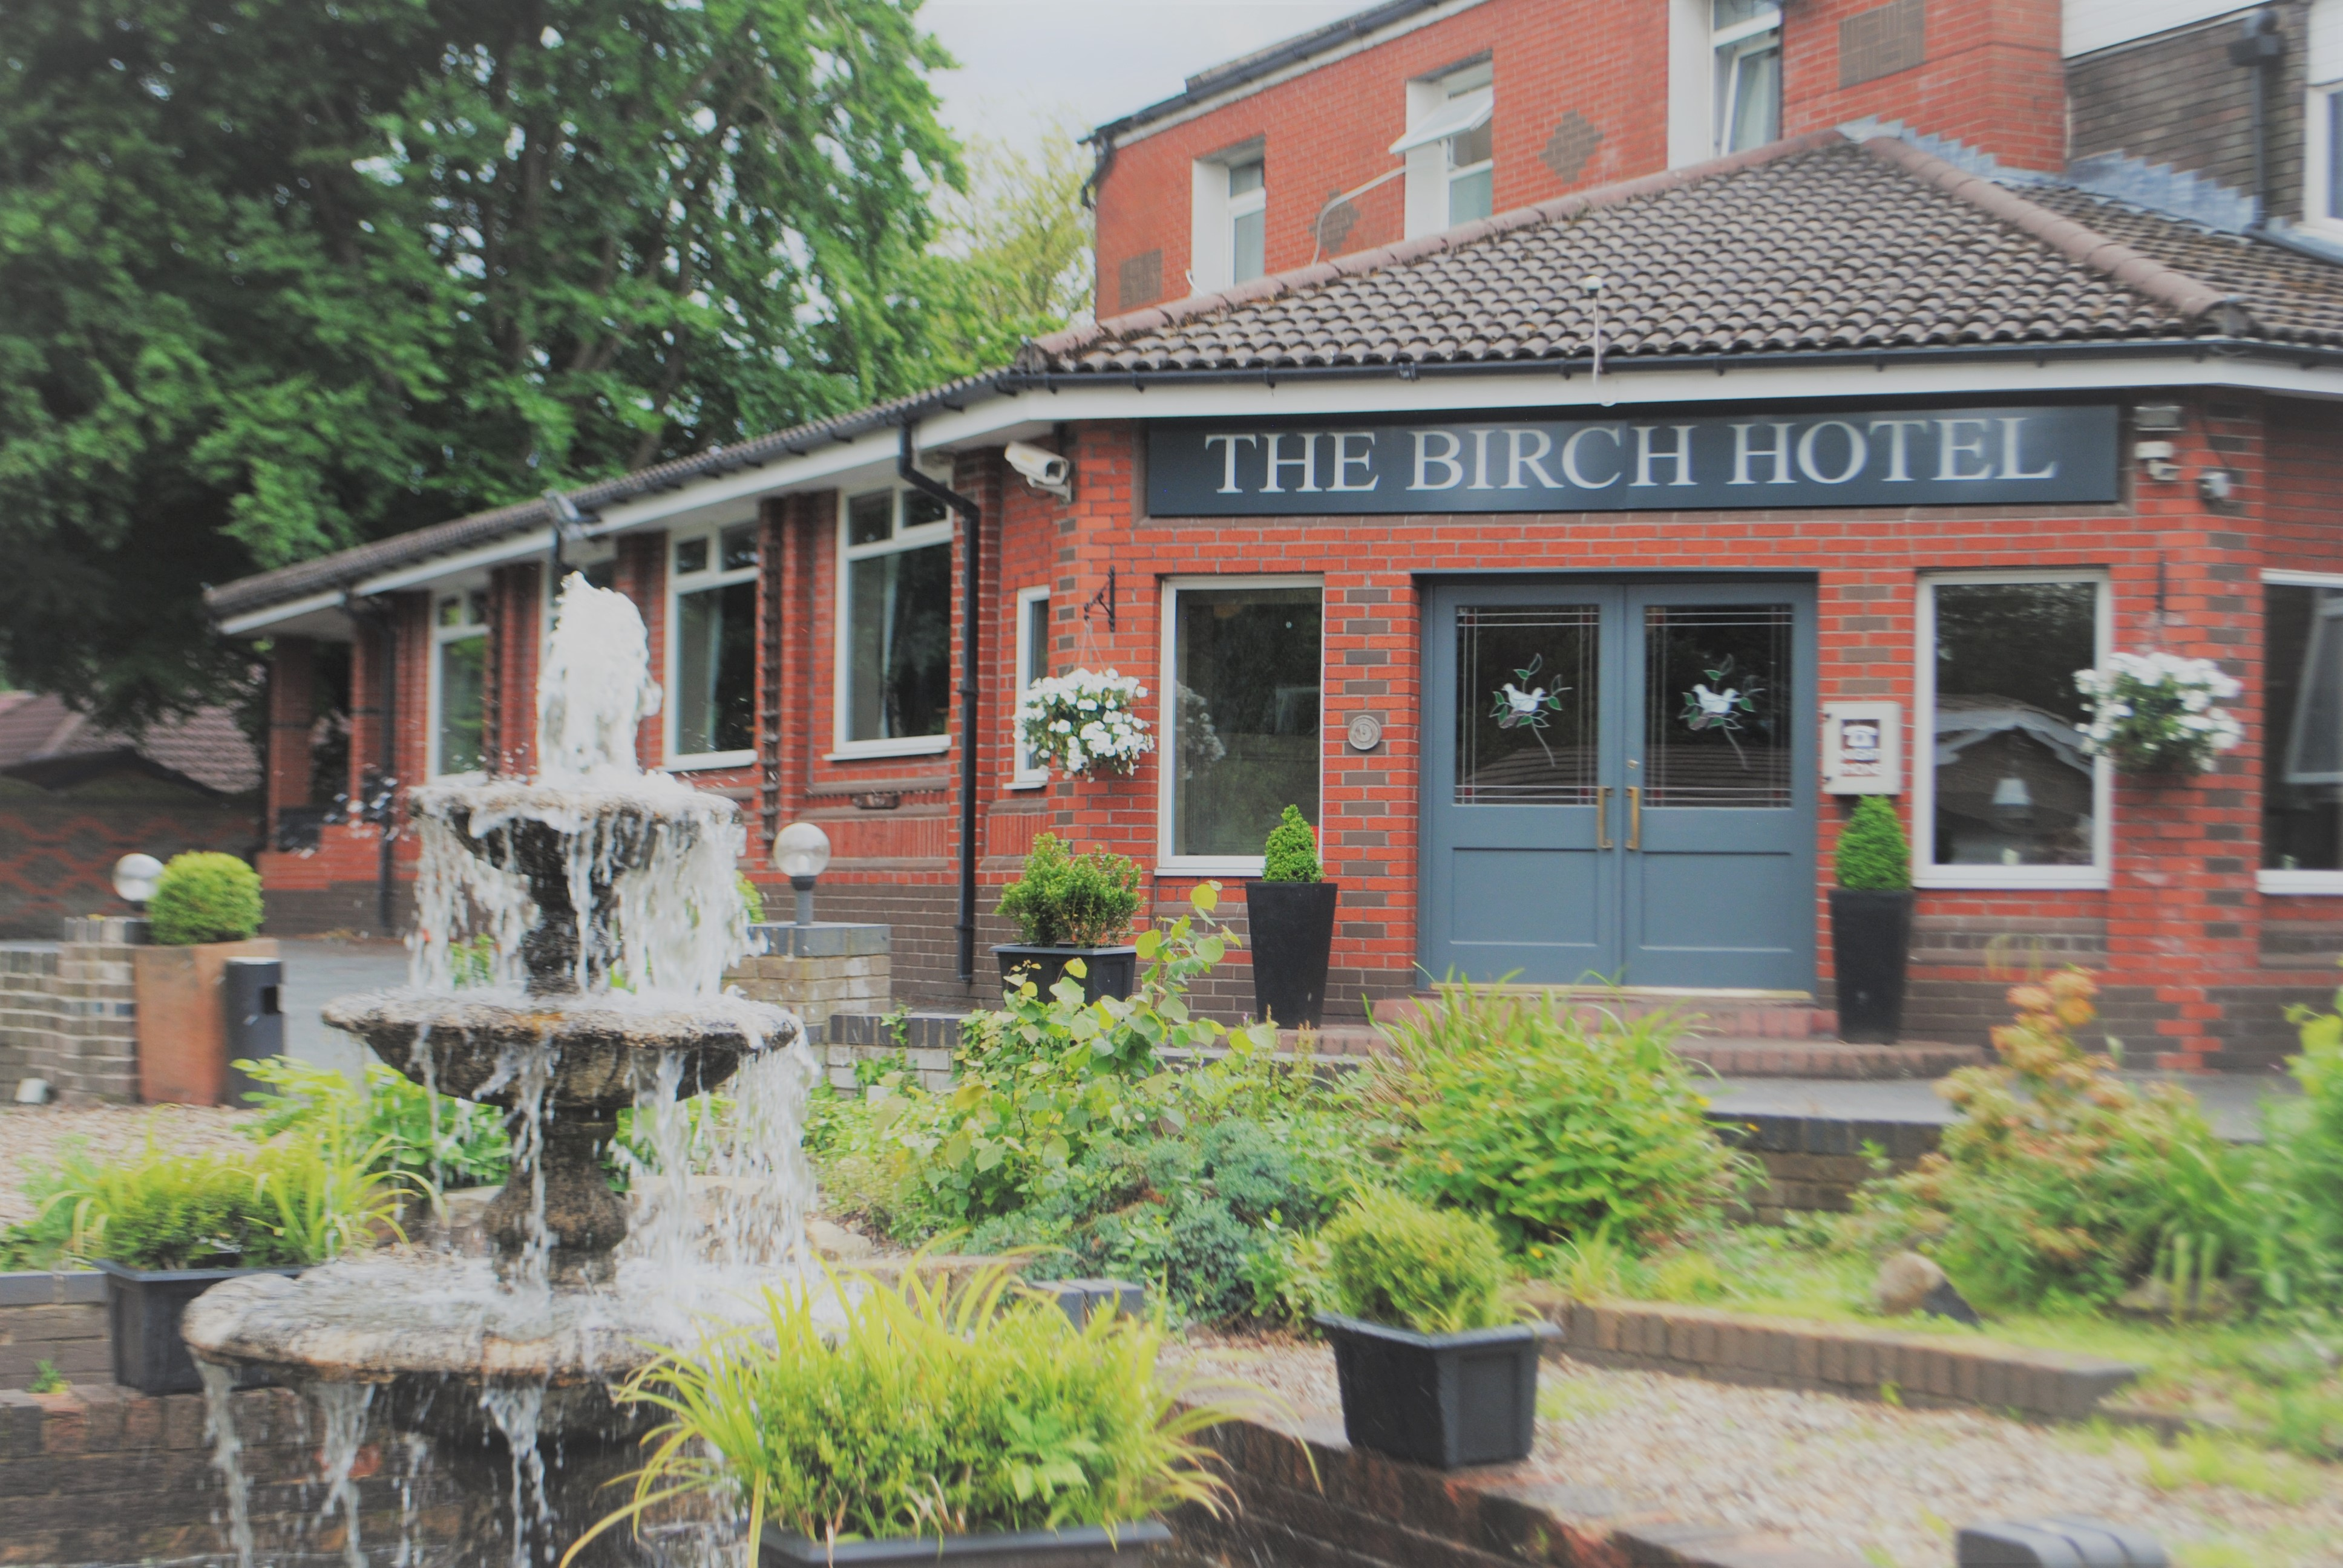 Copyright The Birch Hotel